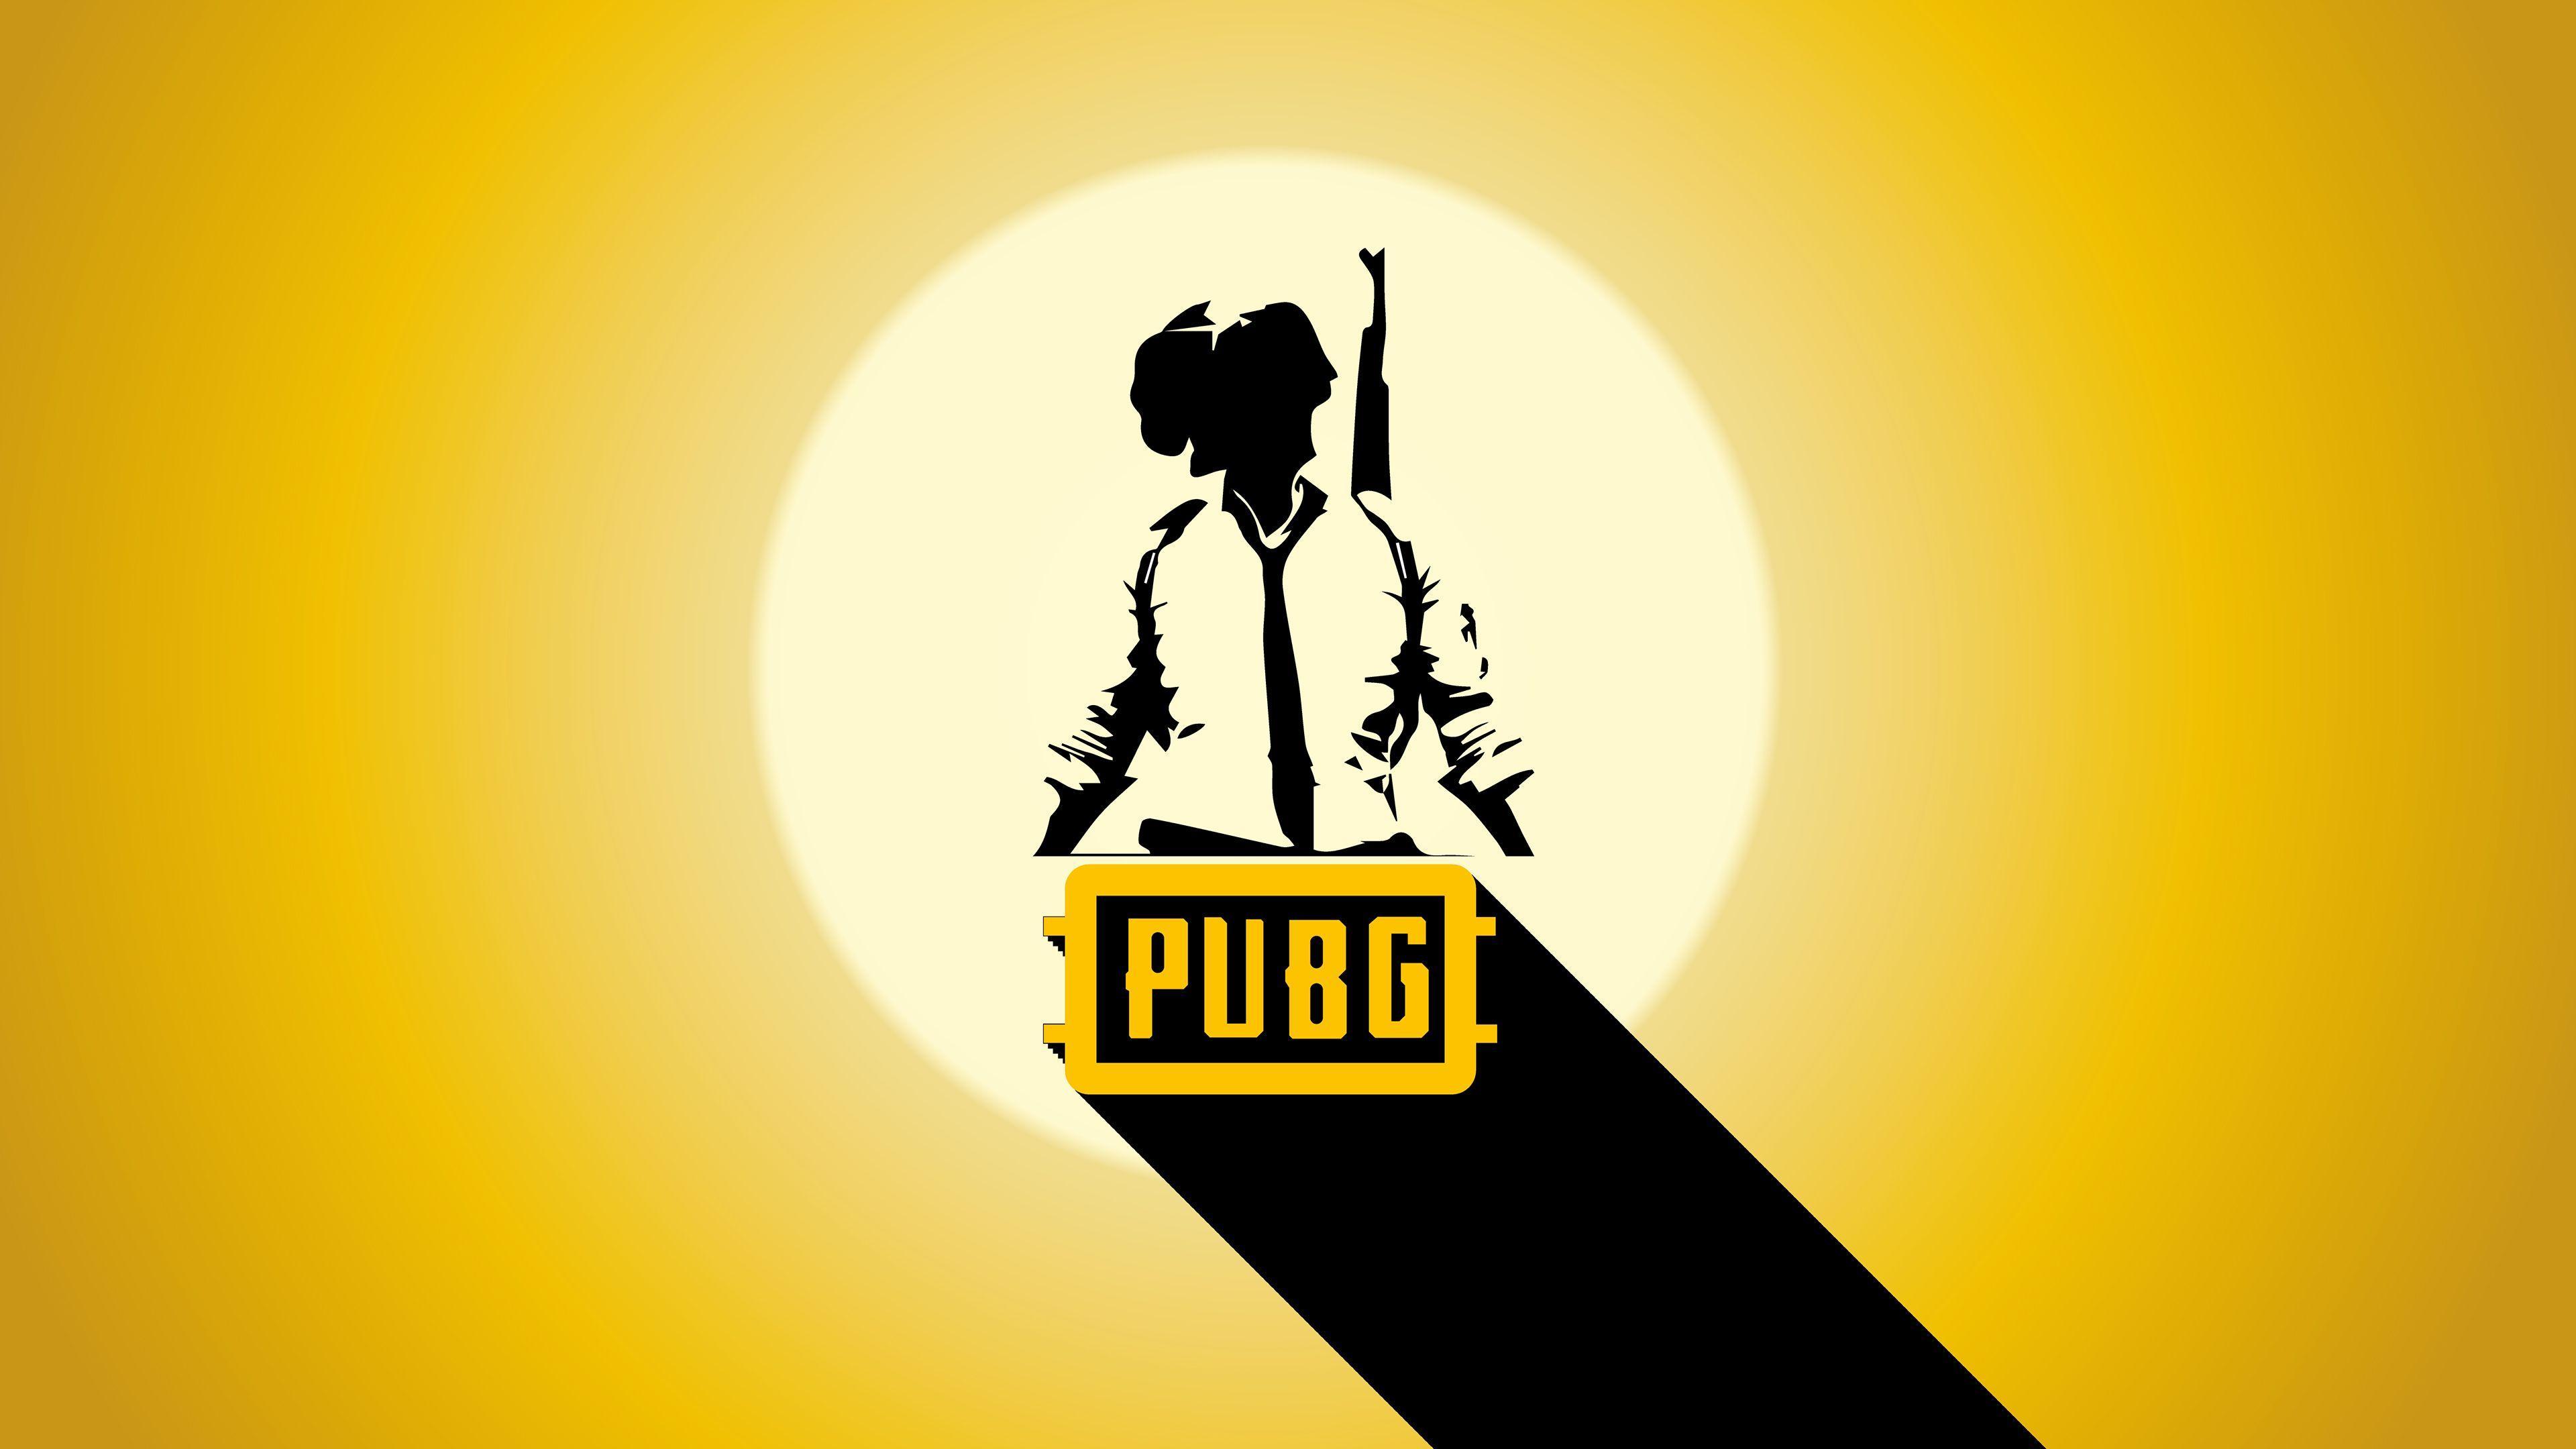 Pubg Logo Wallpapers Top Free Pubg Logo Backgrounds